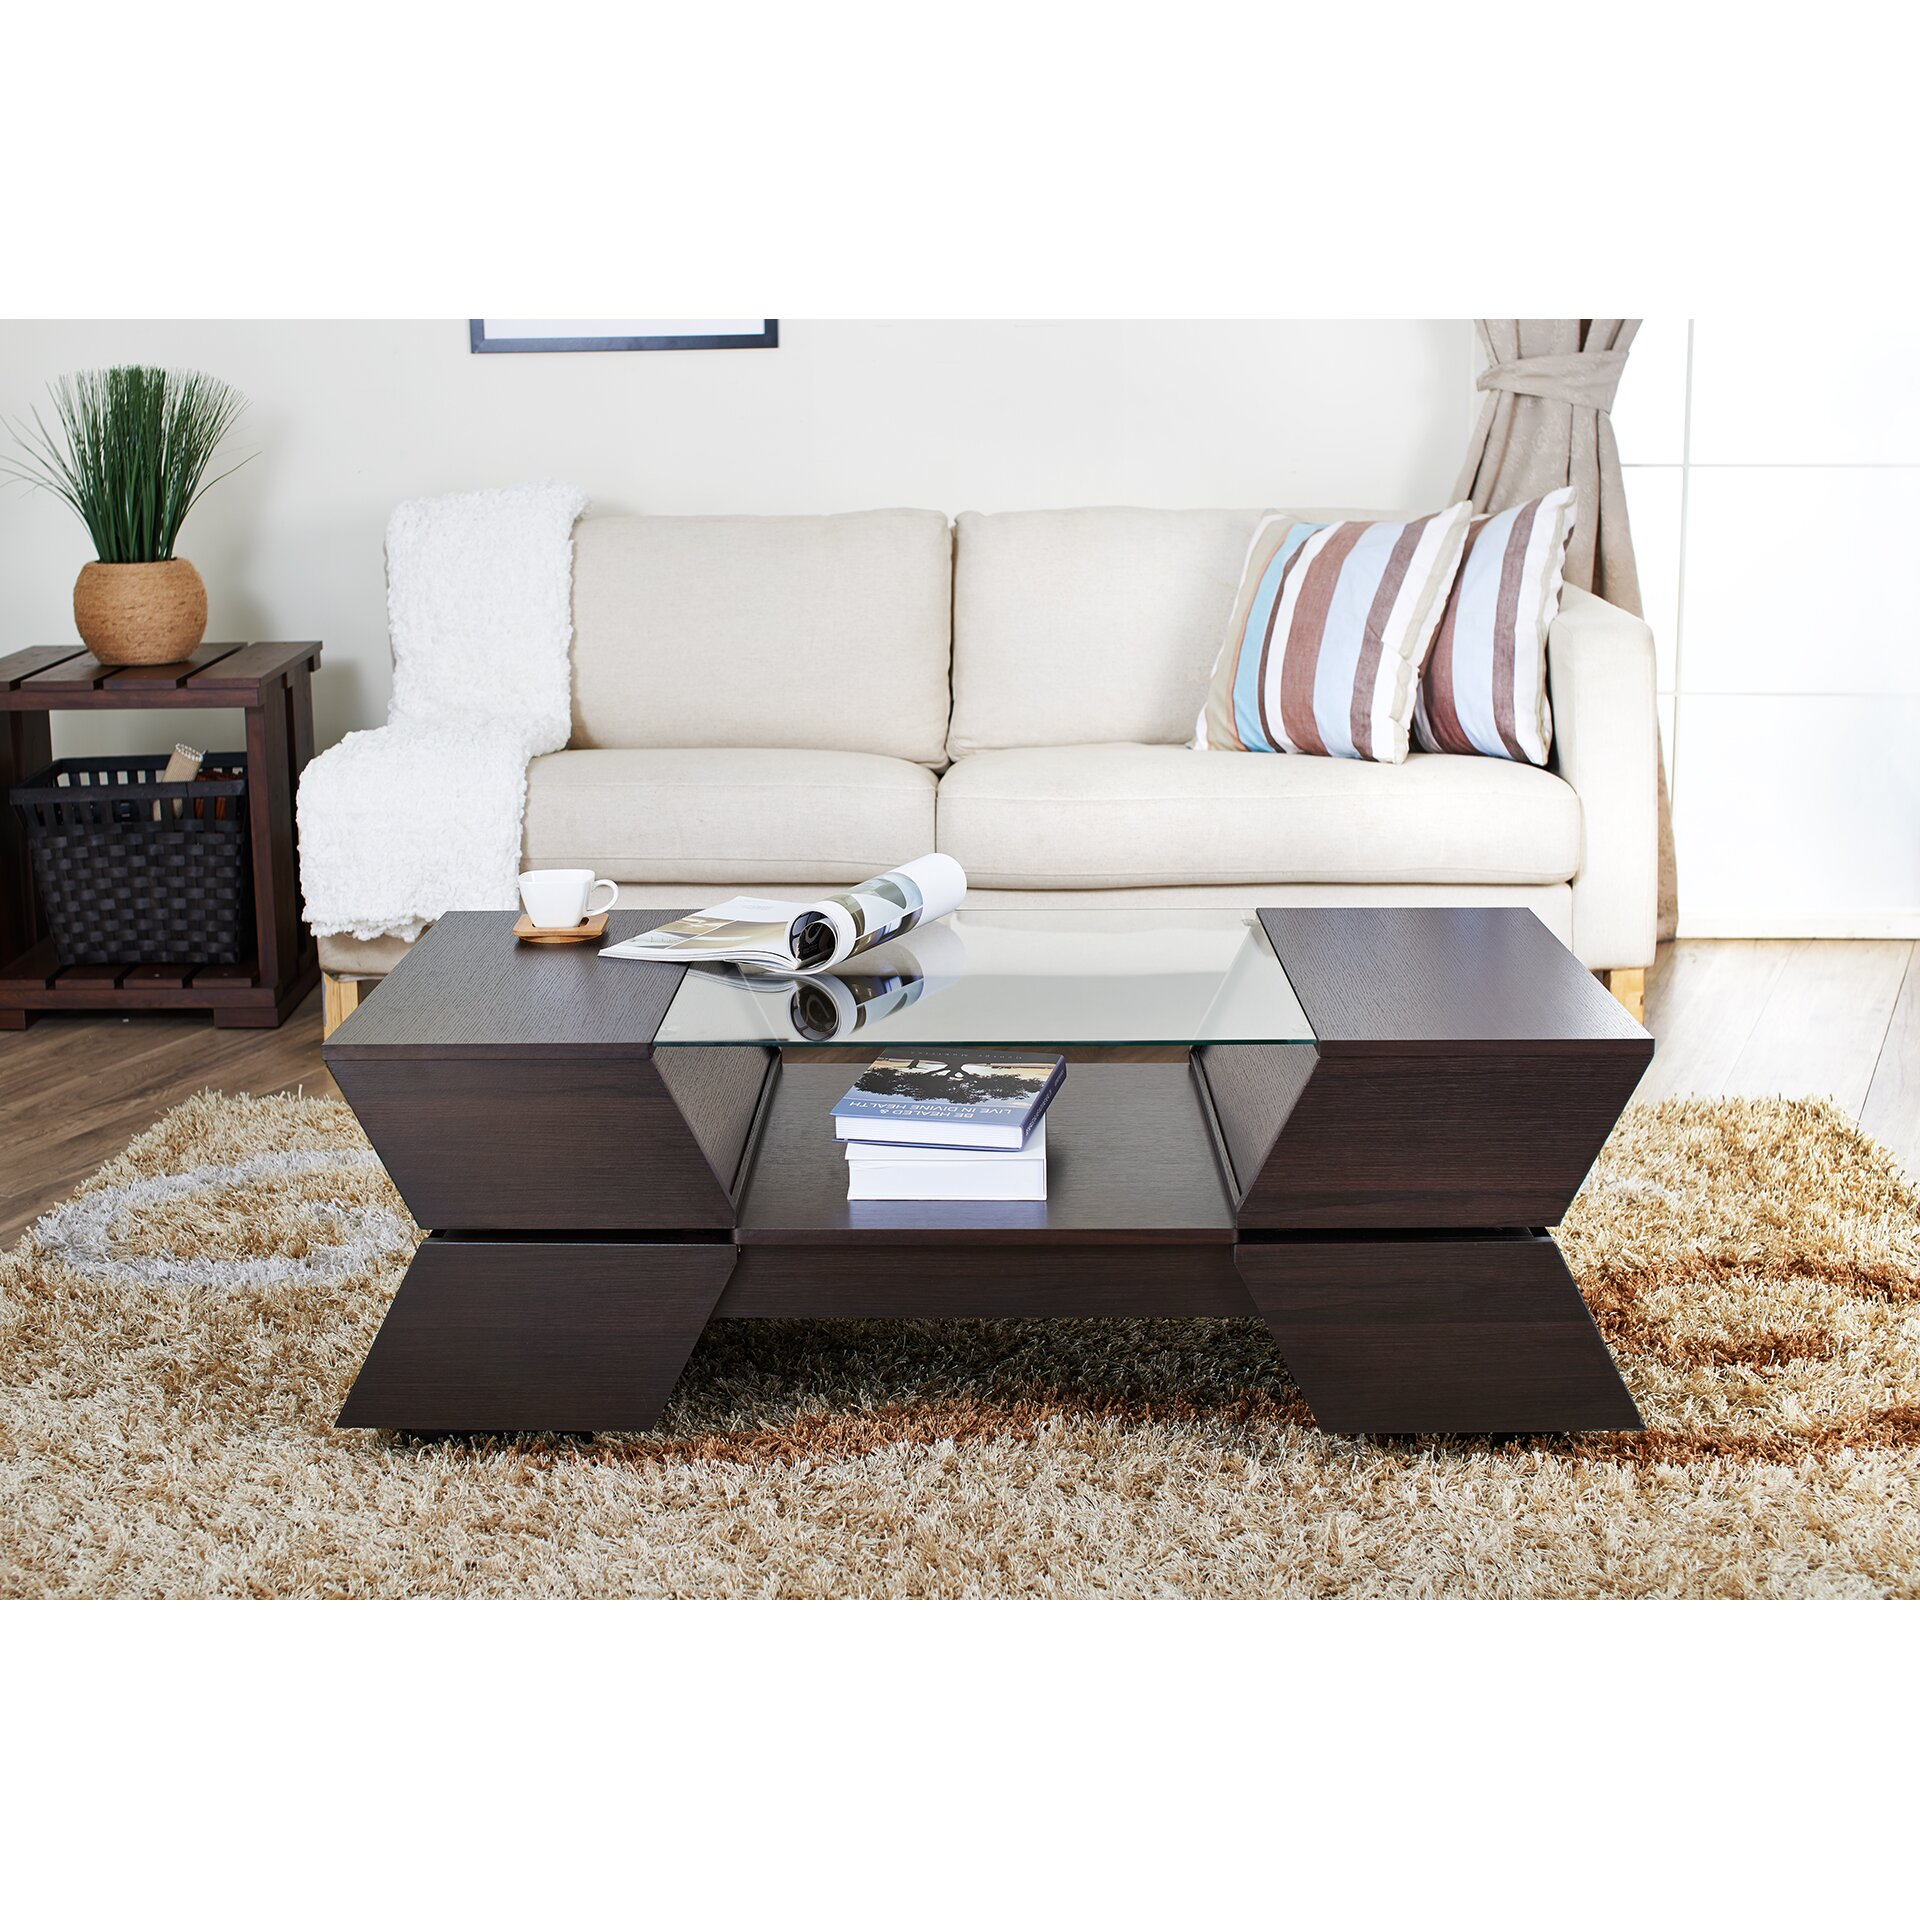 Hokku designs matias coffee table reviews wayfair for Hokku designs living room furniture